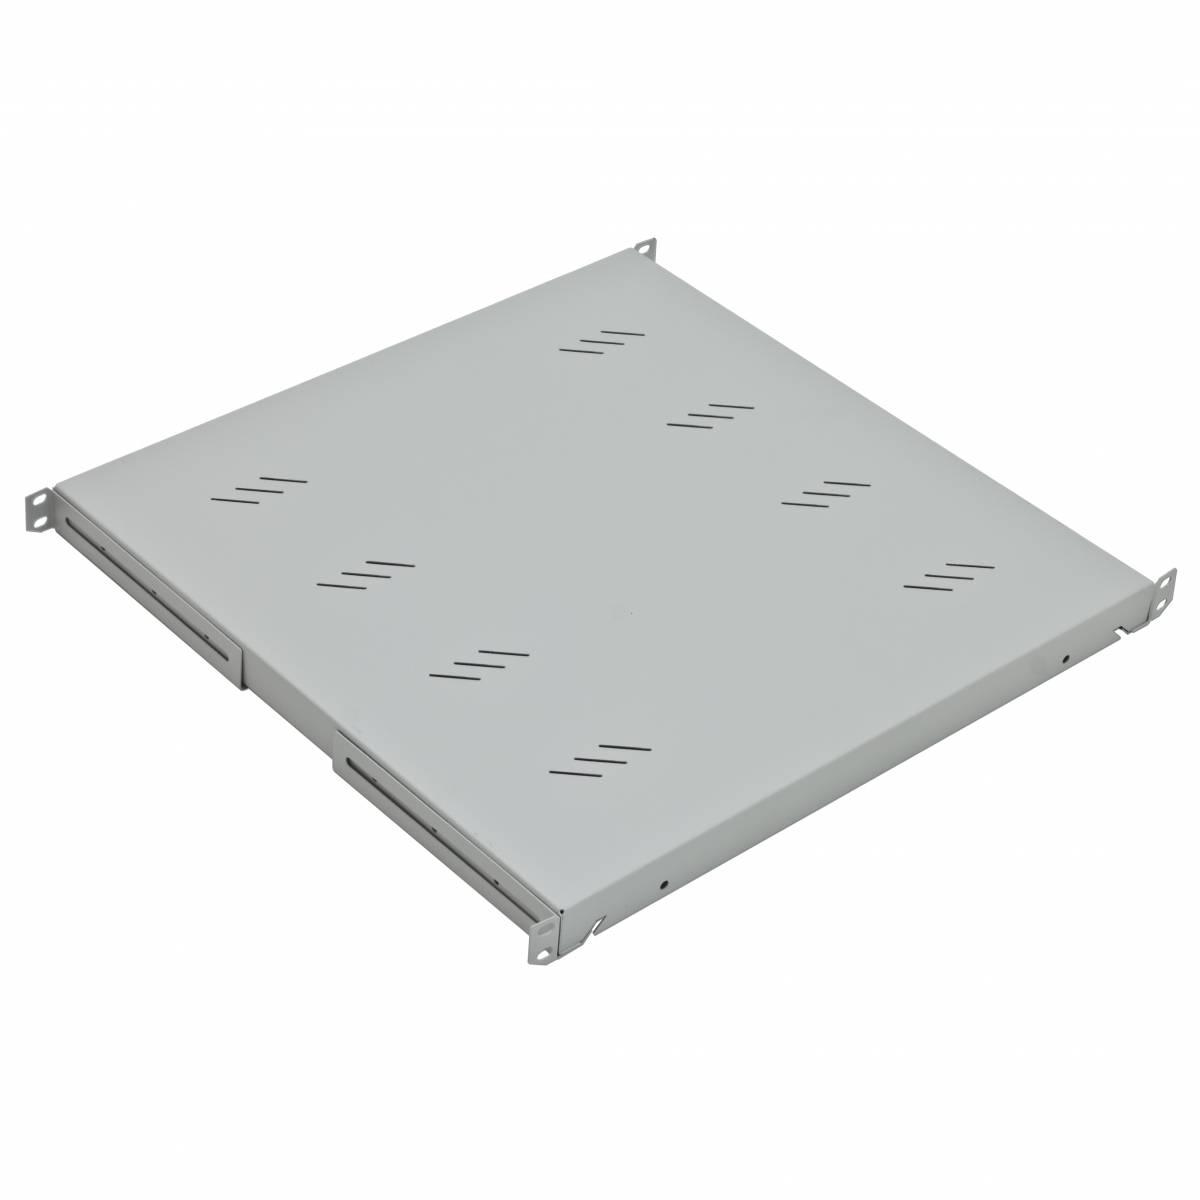 "19"" Shelf Fix, up to 80kg Load, D=650mm, 1U, RAL7035"